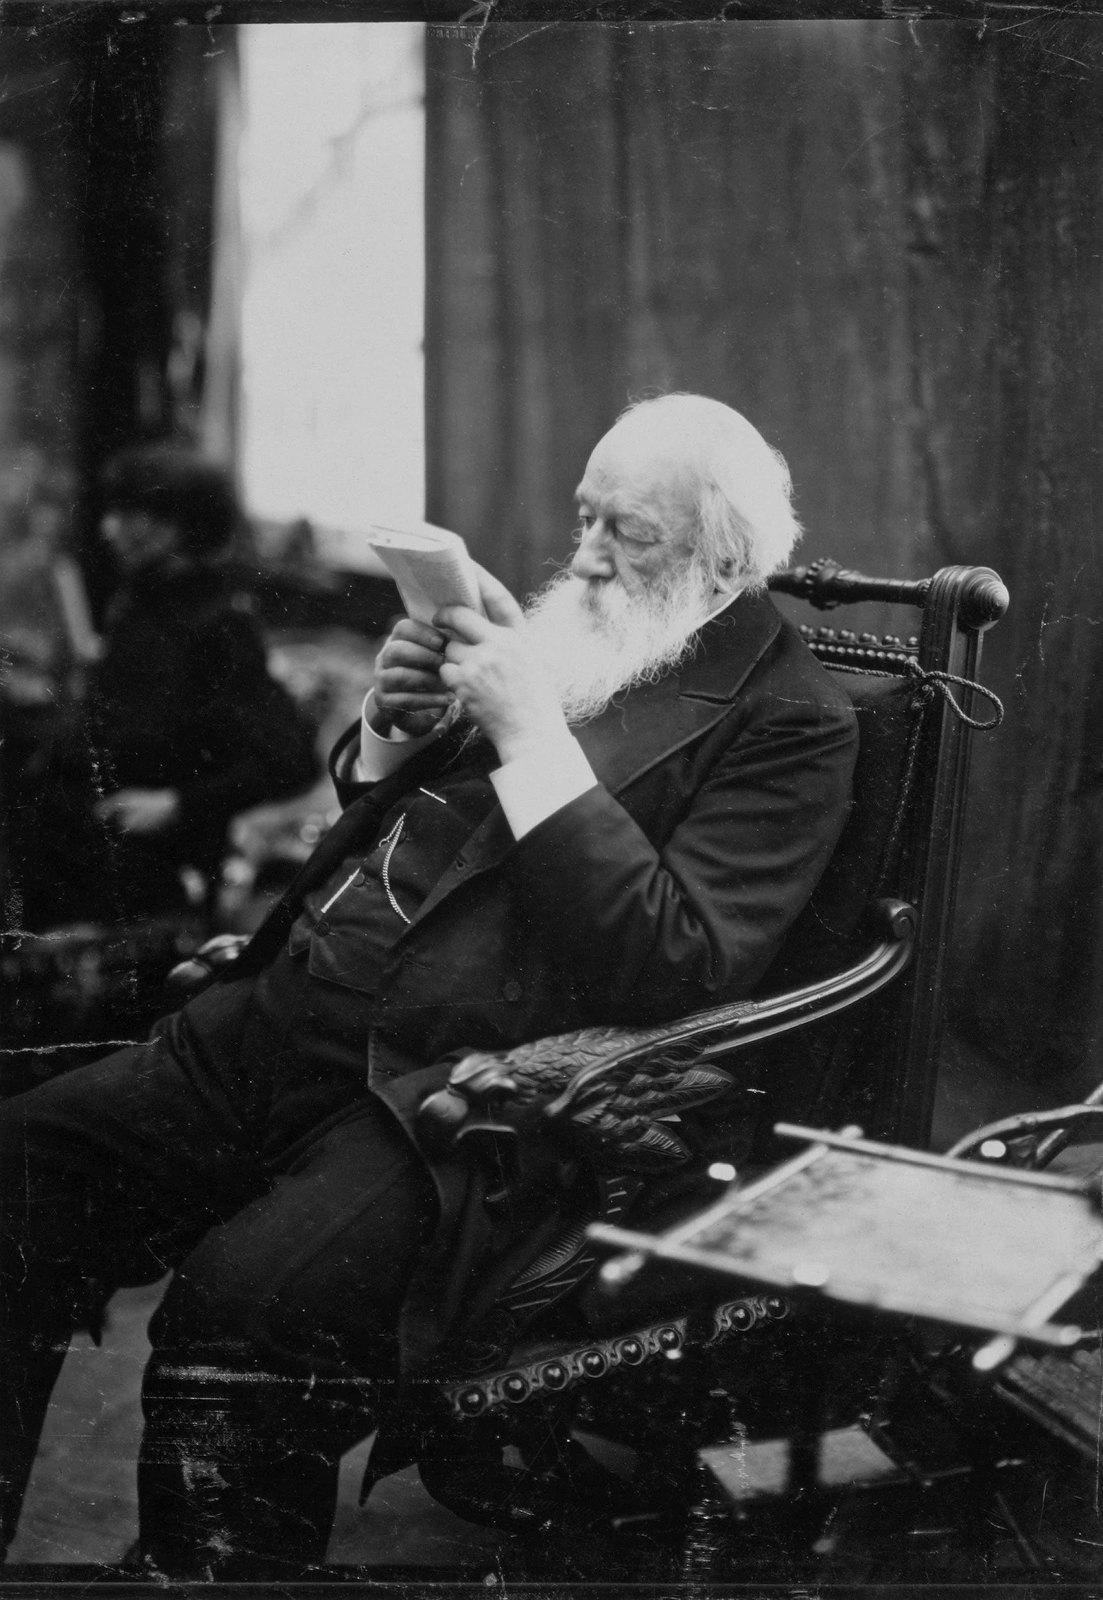 1890-е. Портрет Владимира Васильевича Стасова